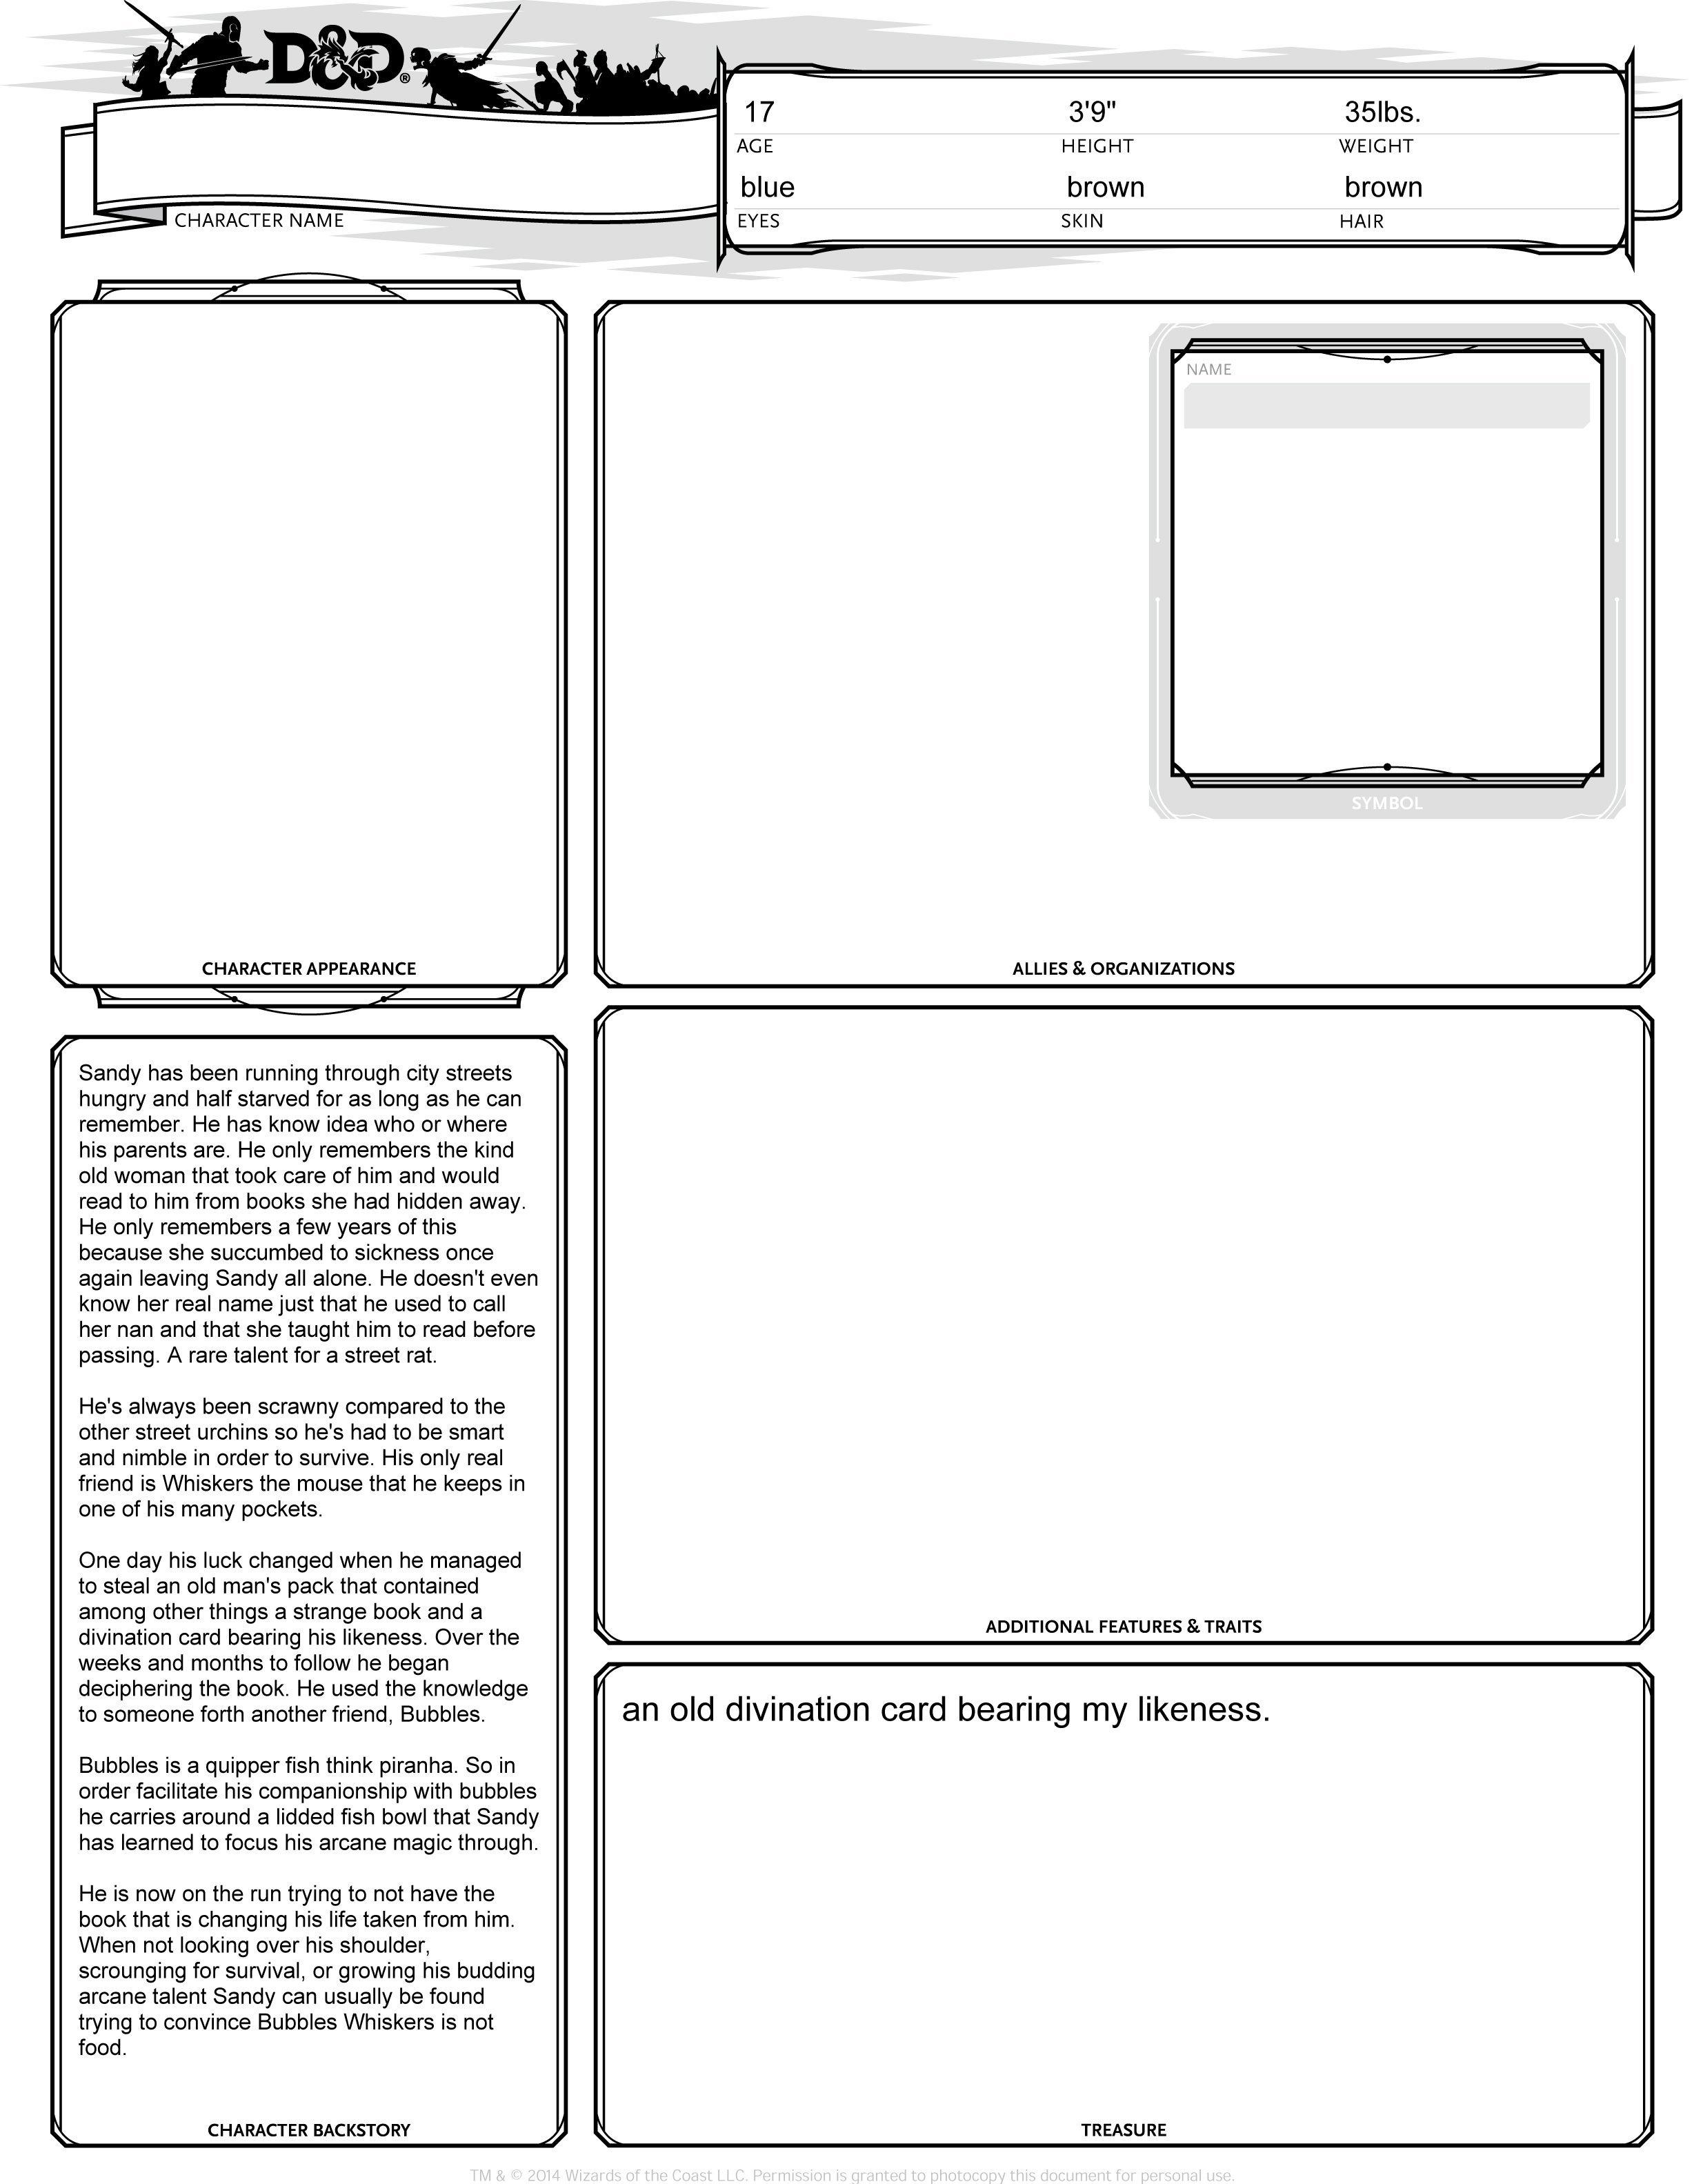 5e Player's Handbook Pdf Free